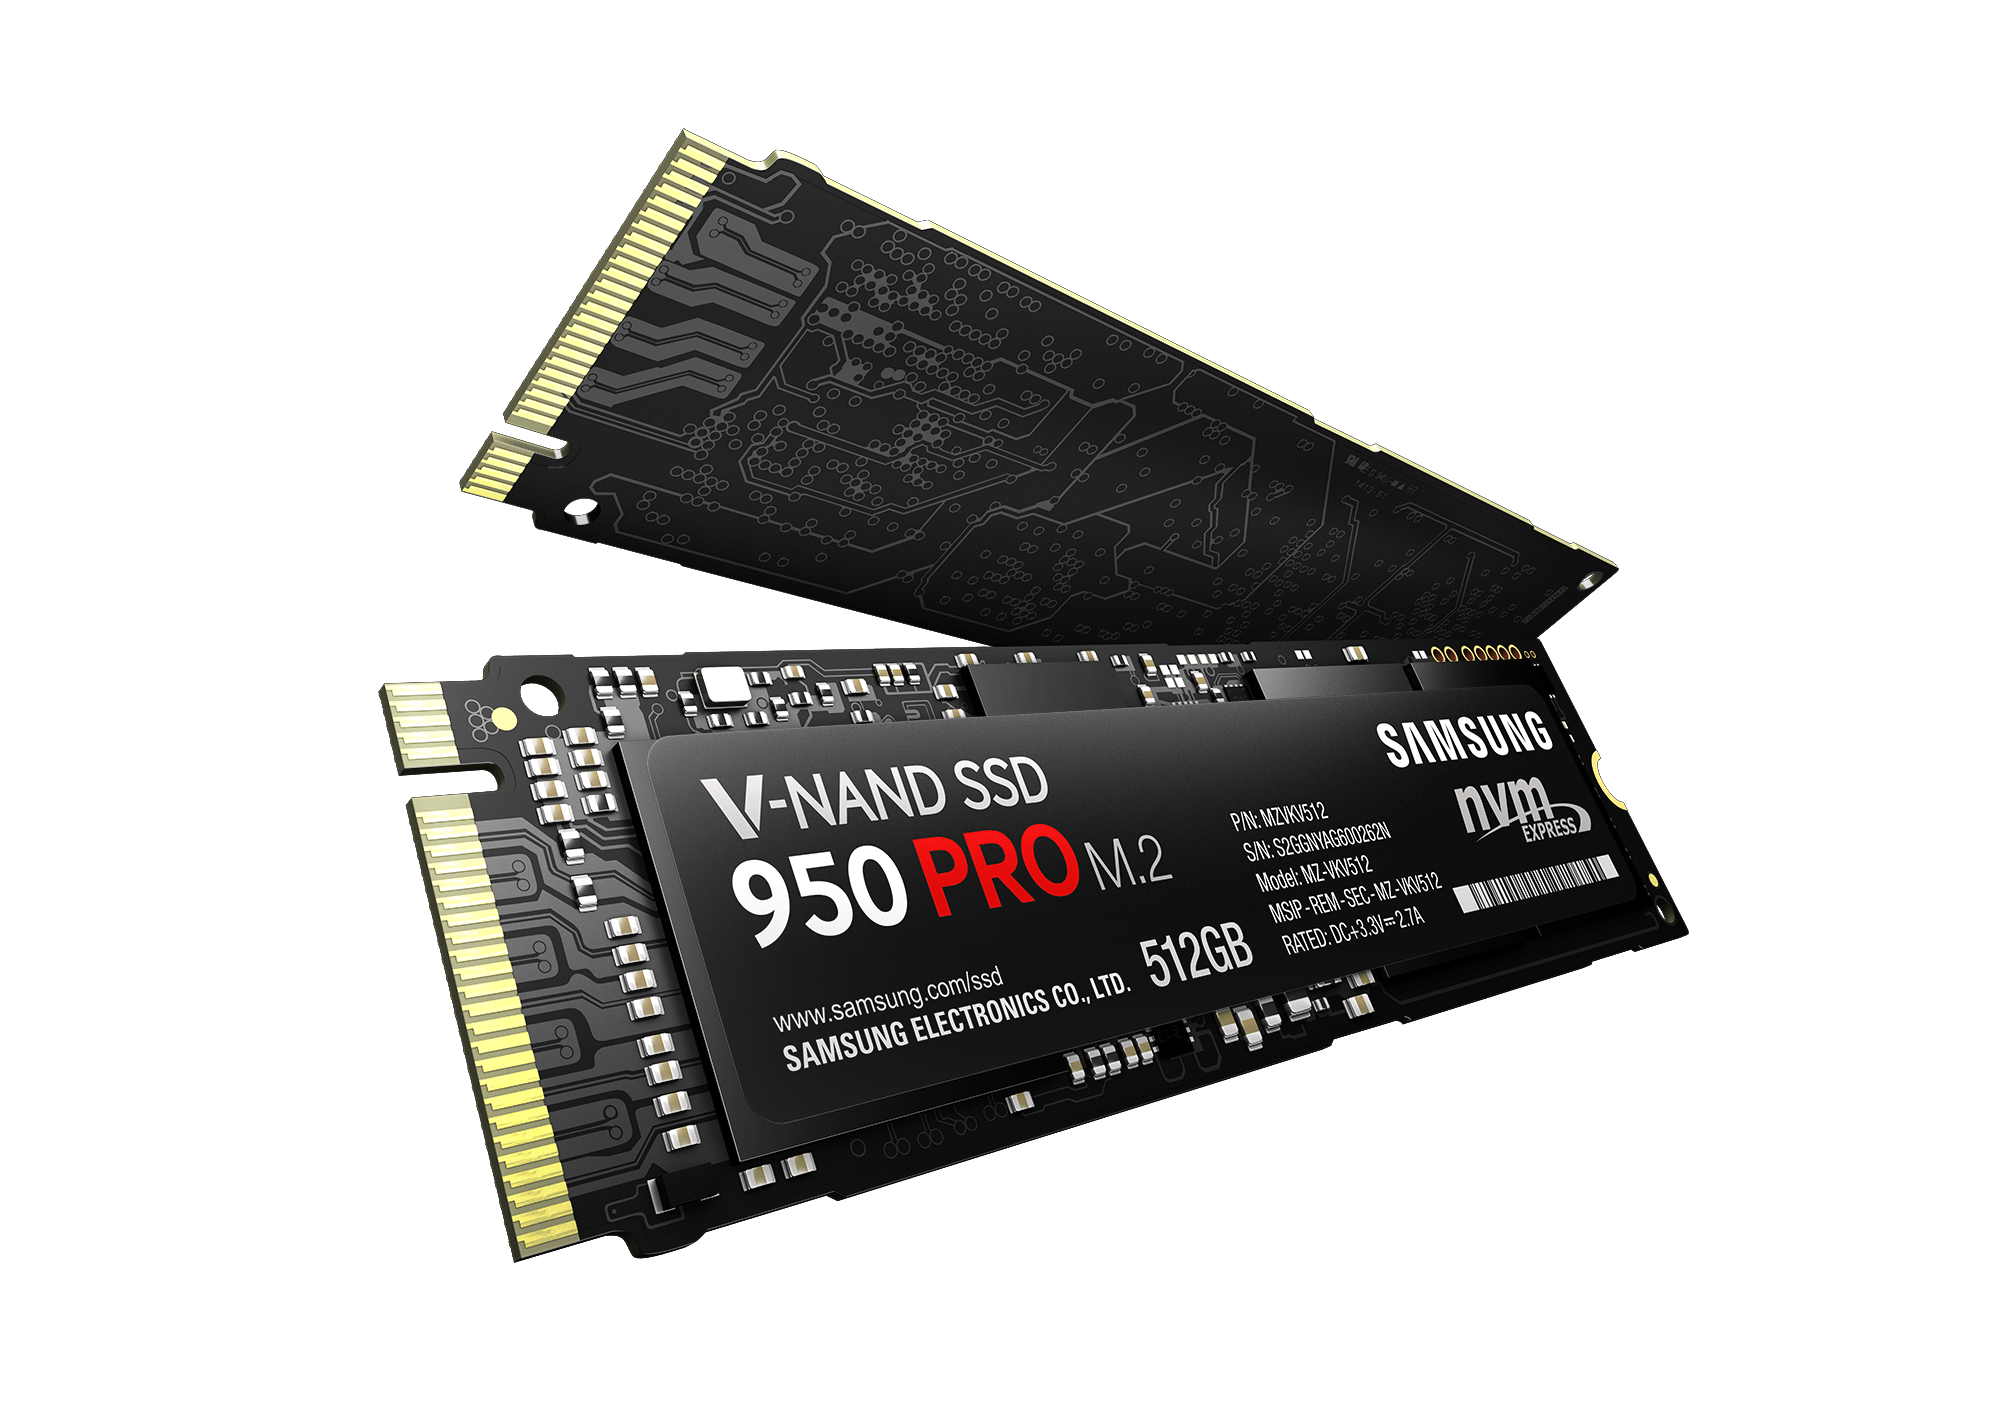 Samsung_SSD_950_Pro (2)